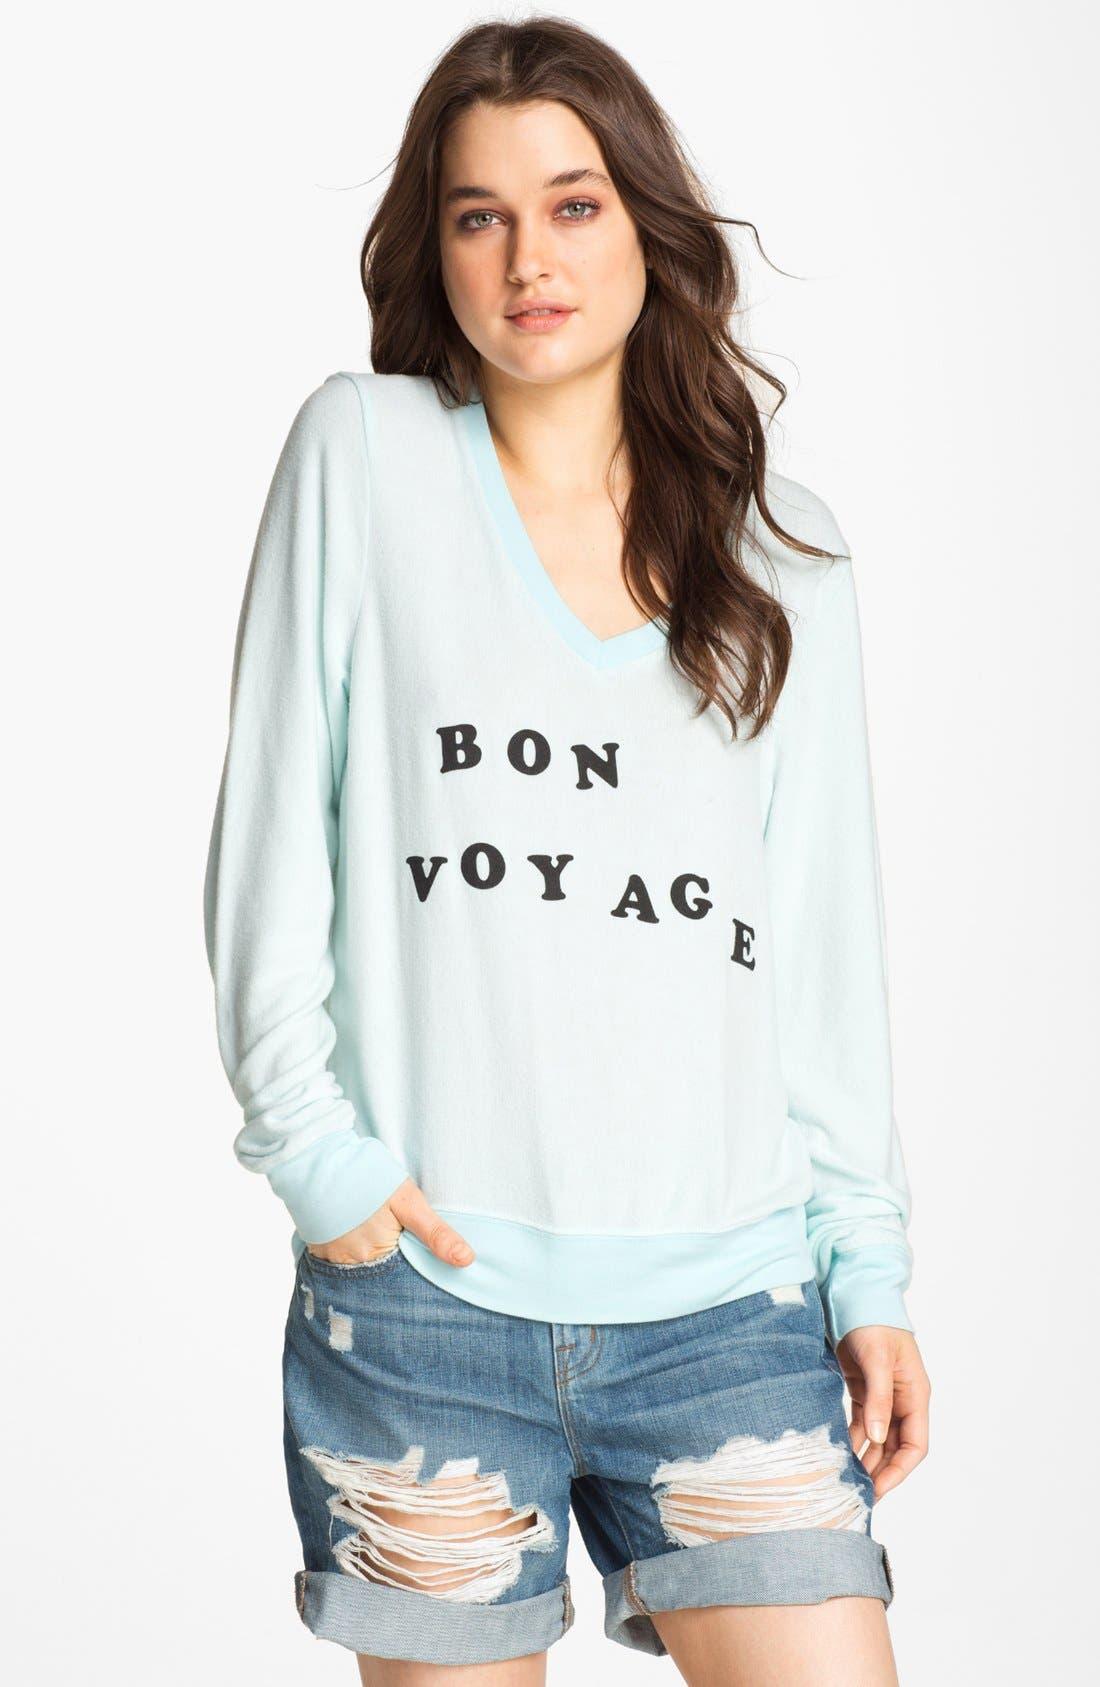 Main Image - Wildfox 'Bon Voyage' Graphic Sweatshirt (Nordstrom Exclusive)